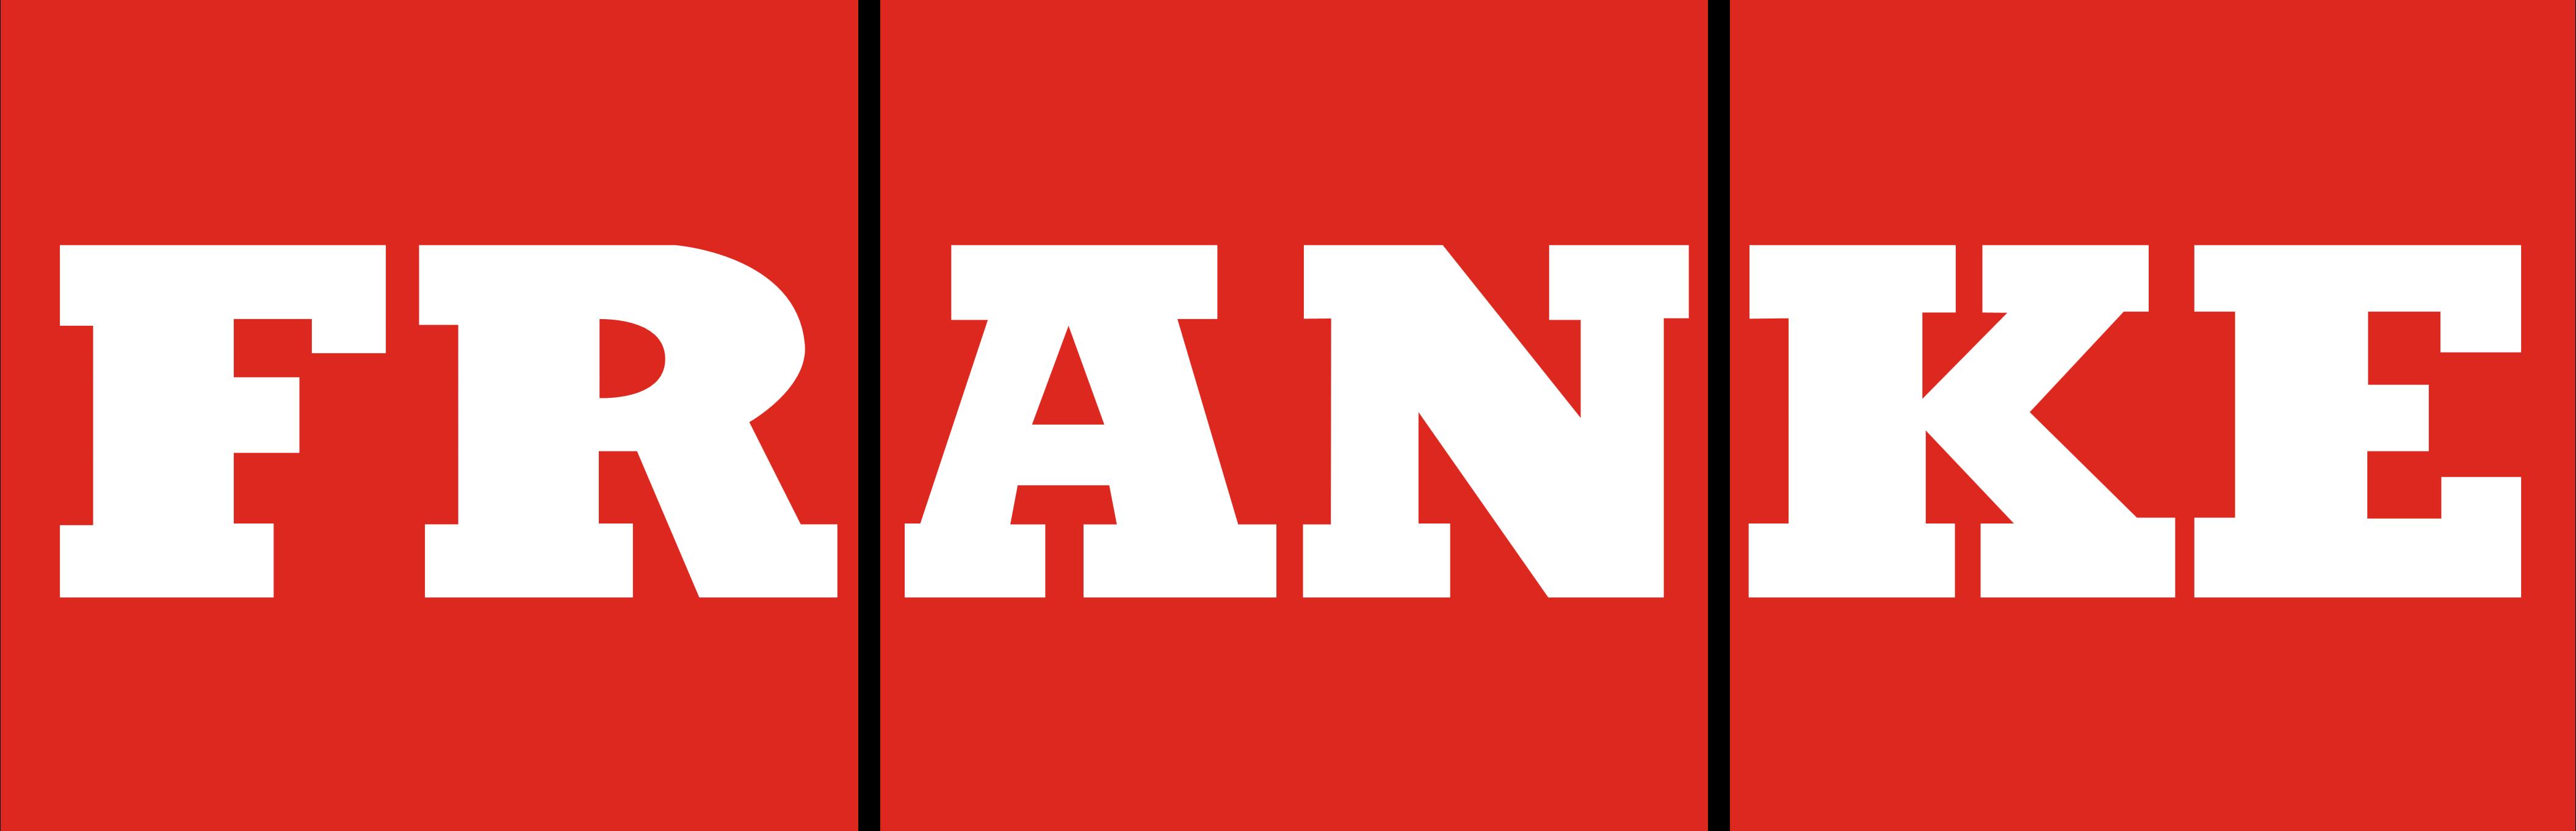 Imagini pentru FRANKE logo